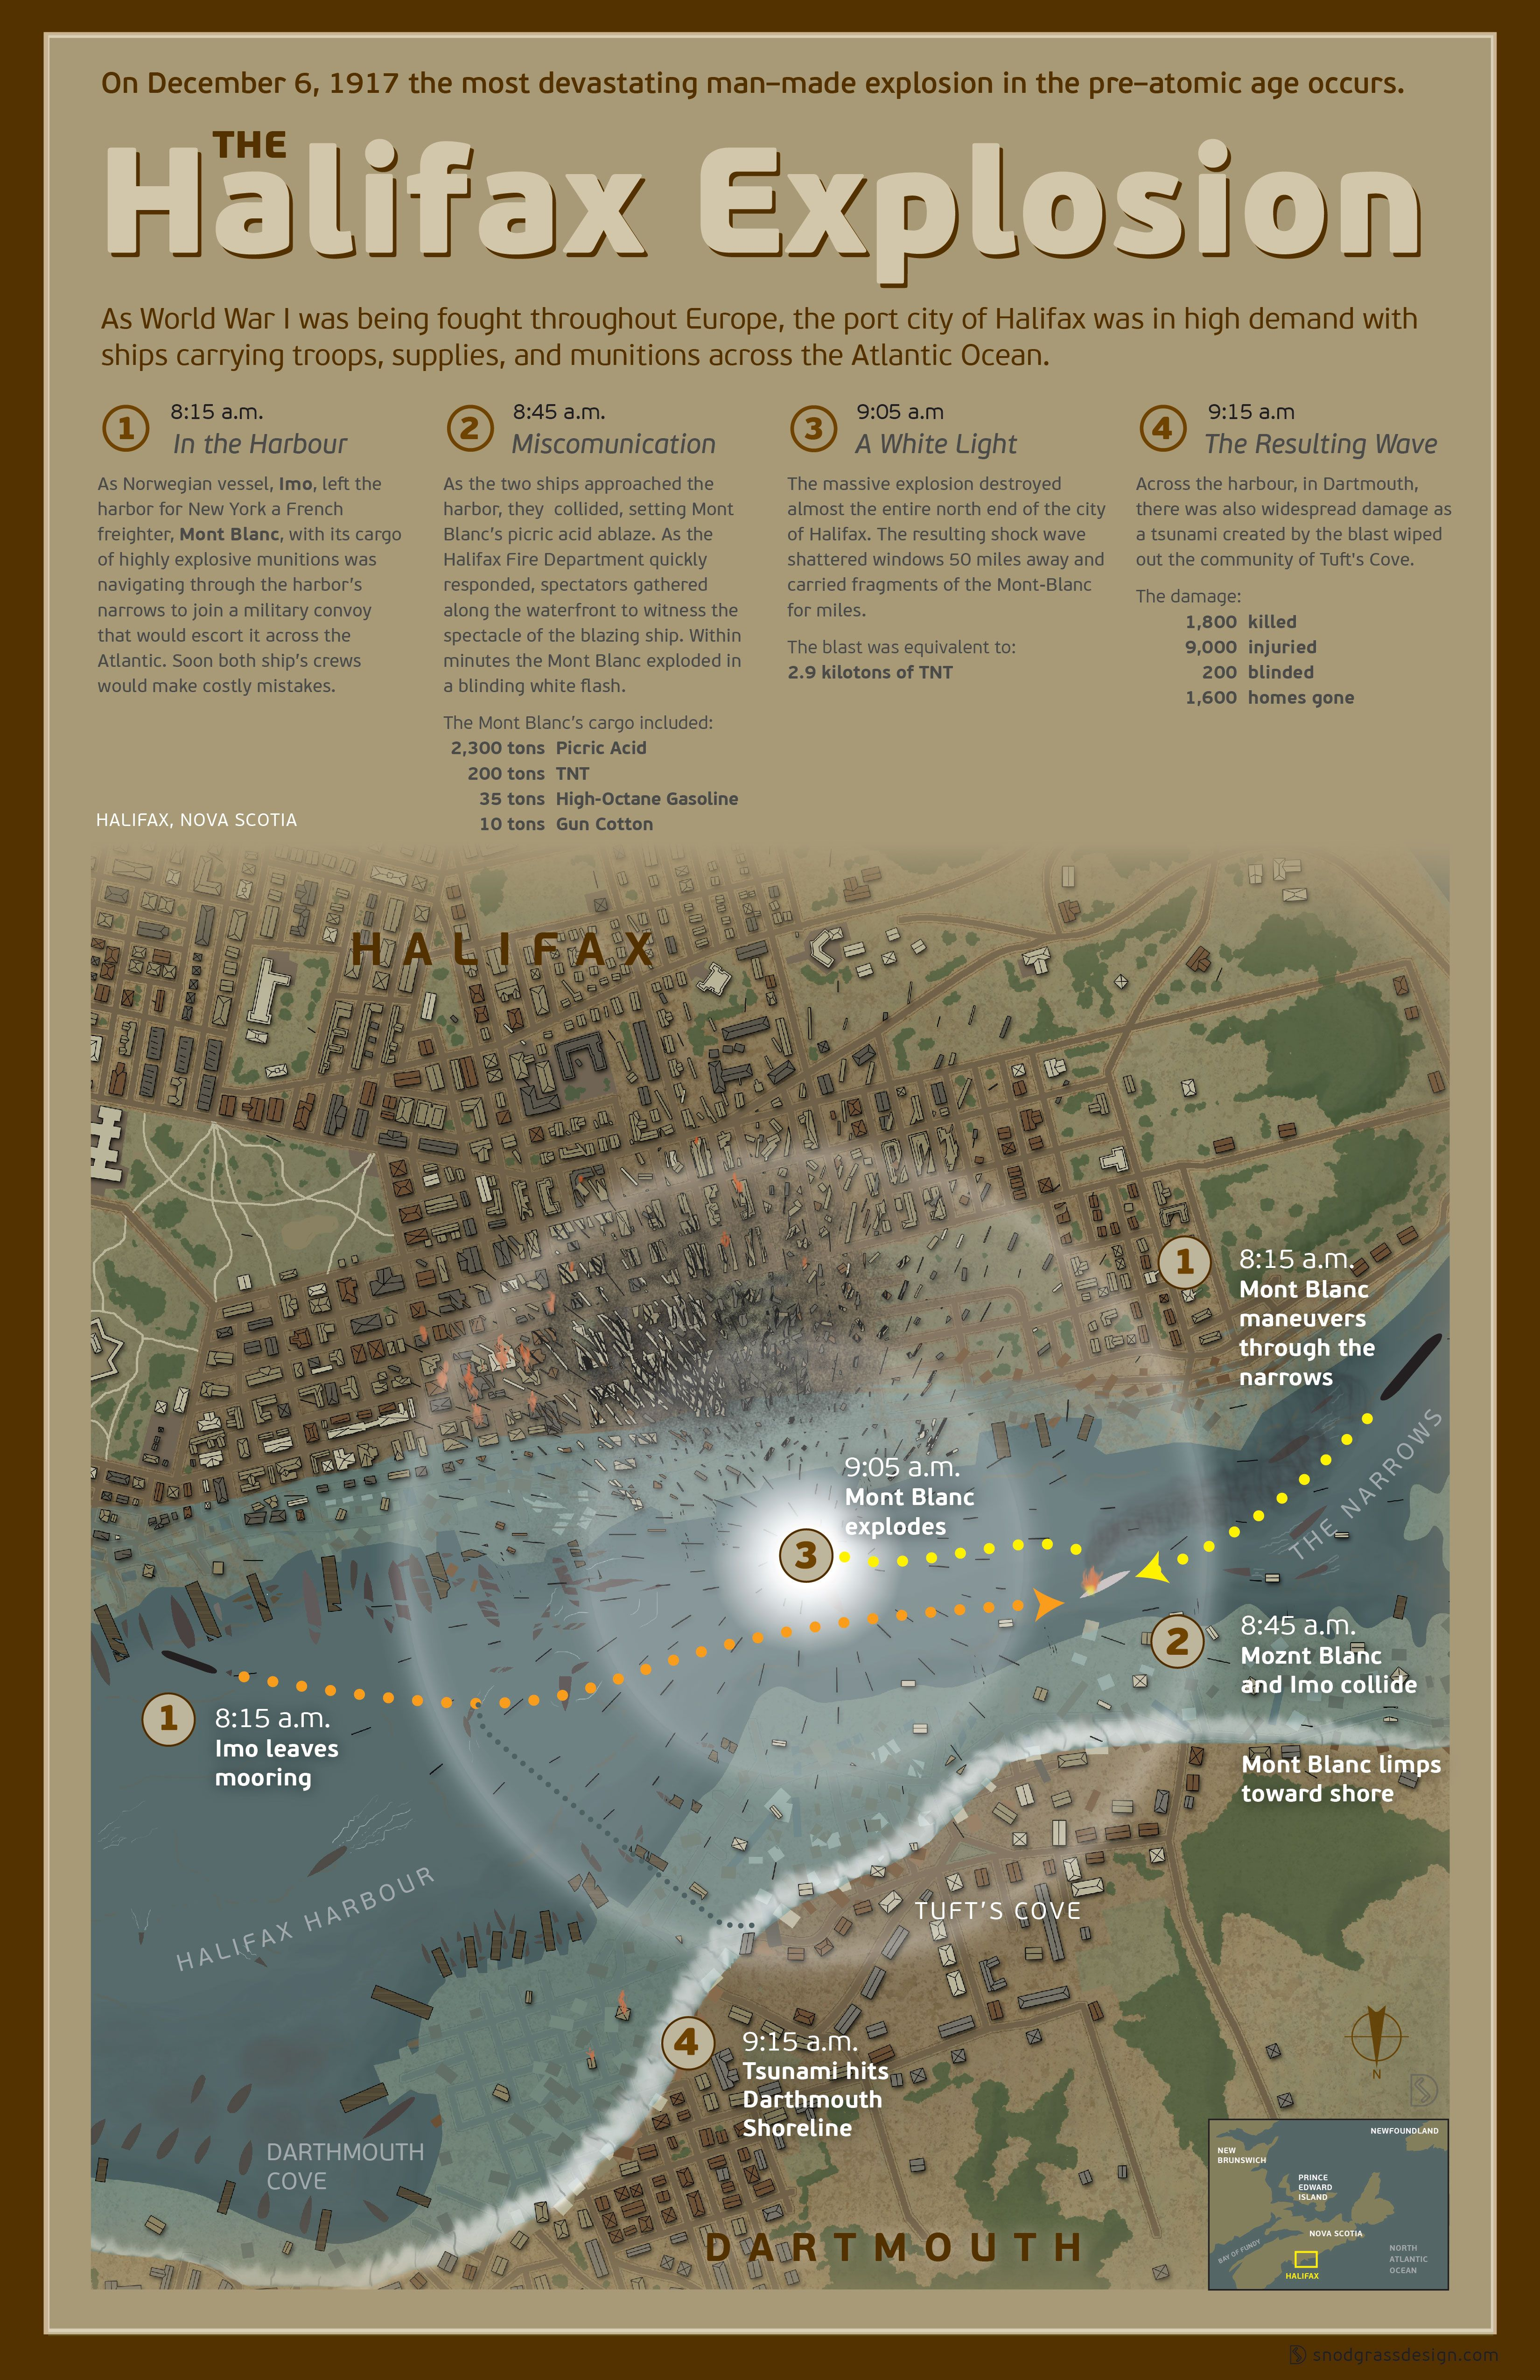 Halifax explosion map a disaster snodgrassdesigncom Pinterest